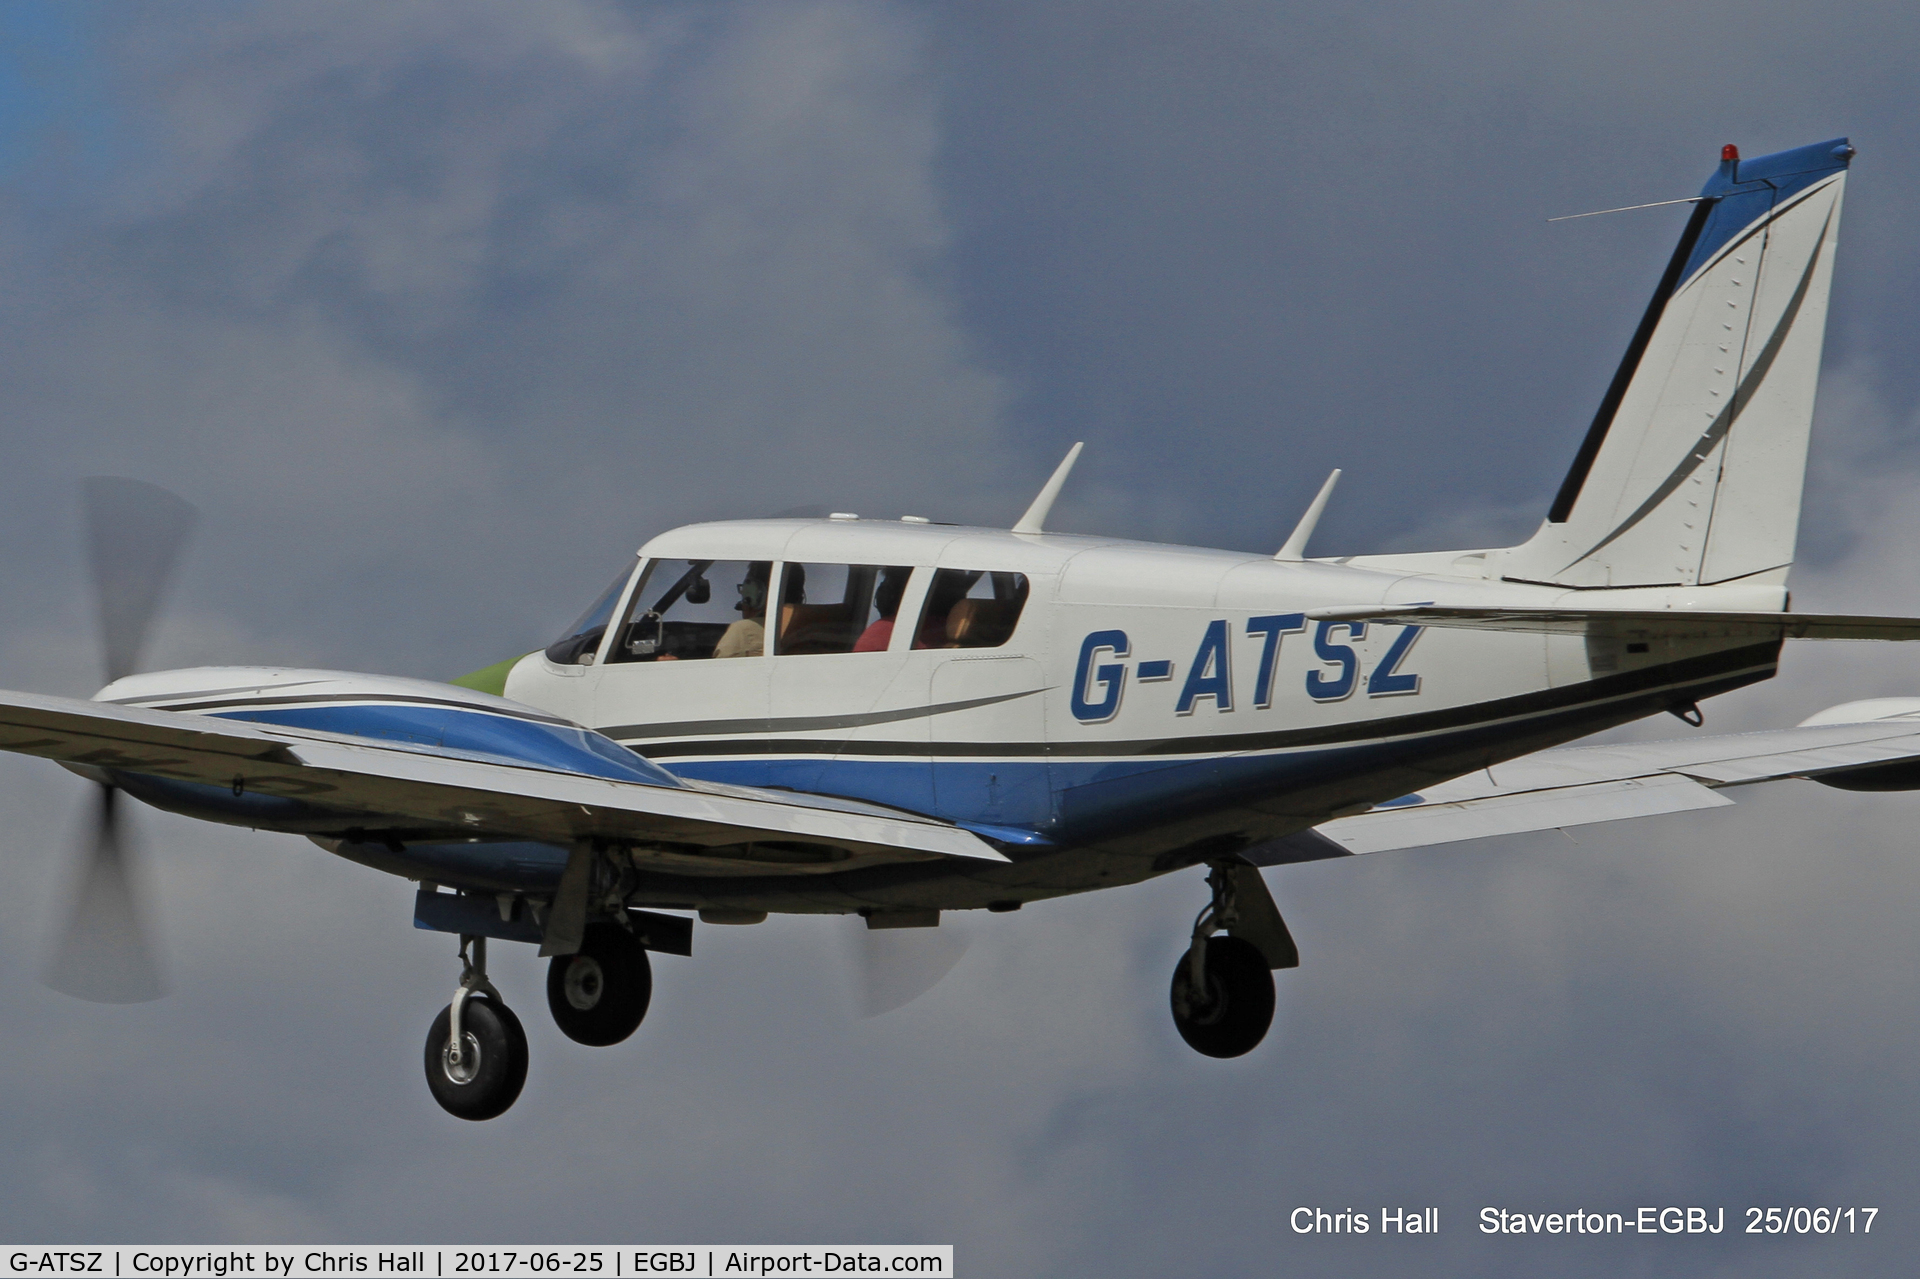 G-ATSZ, 1966 Piper PA-30 Twin Comanche C/N 30-1002, Project Propeller at Staverton